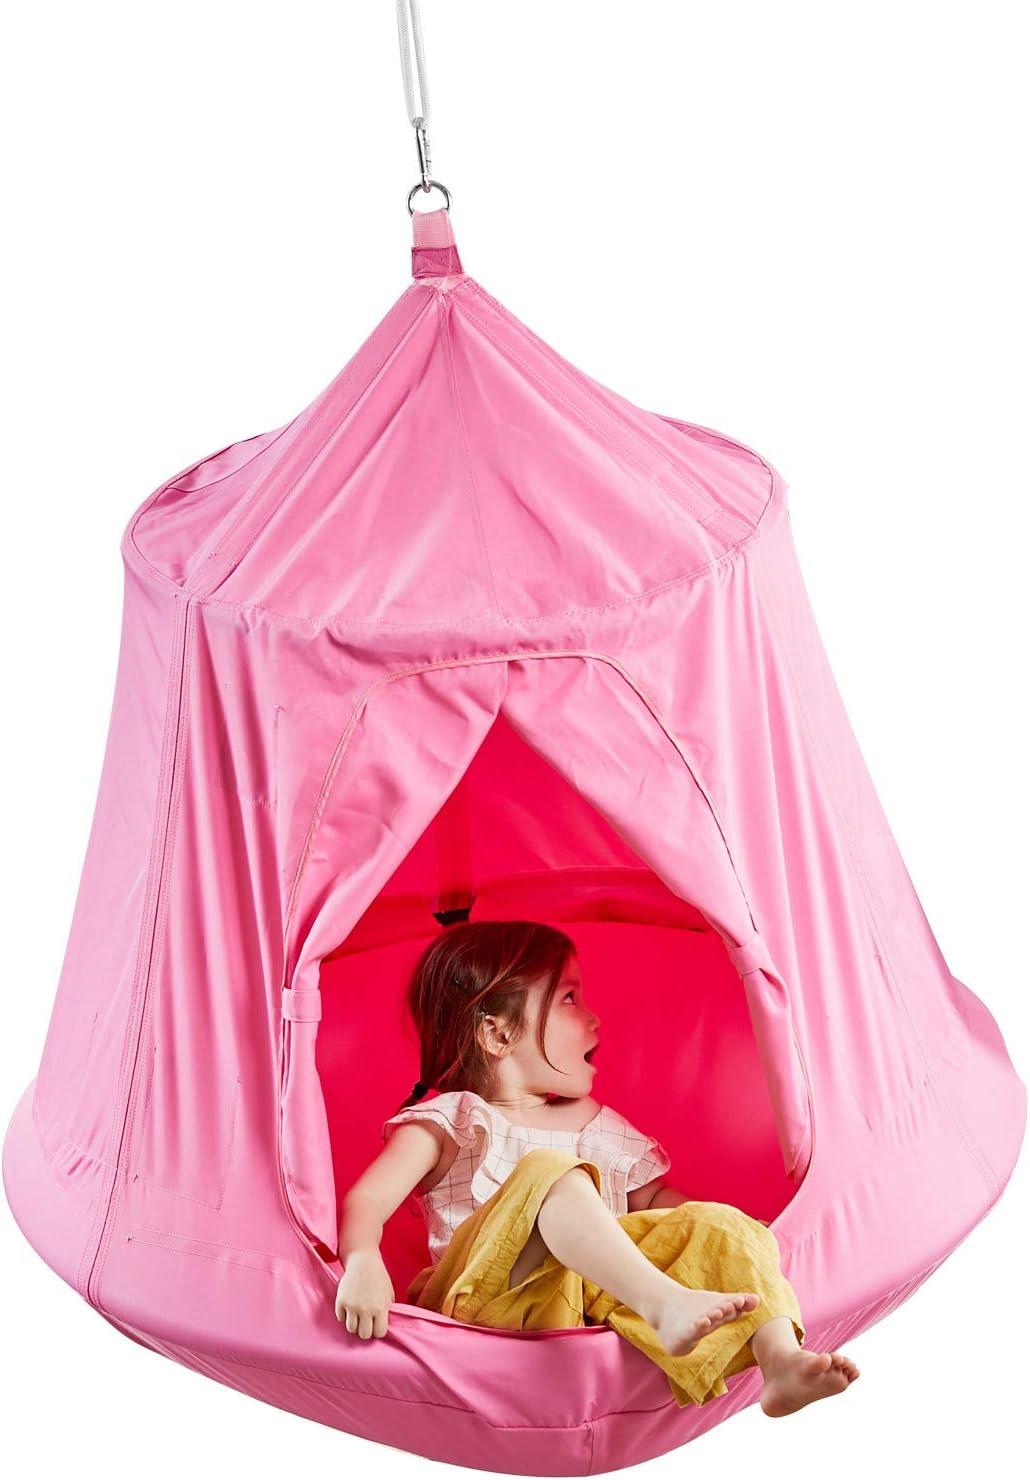 Kids Outdoor Waterproof Play Tent Hanging Hammock with Lights String